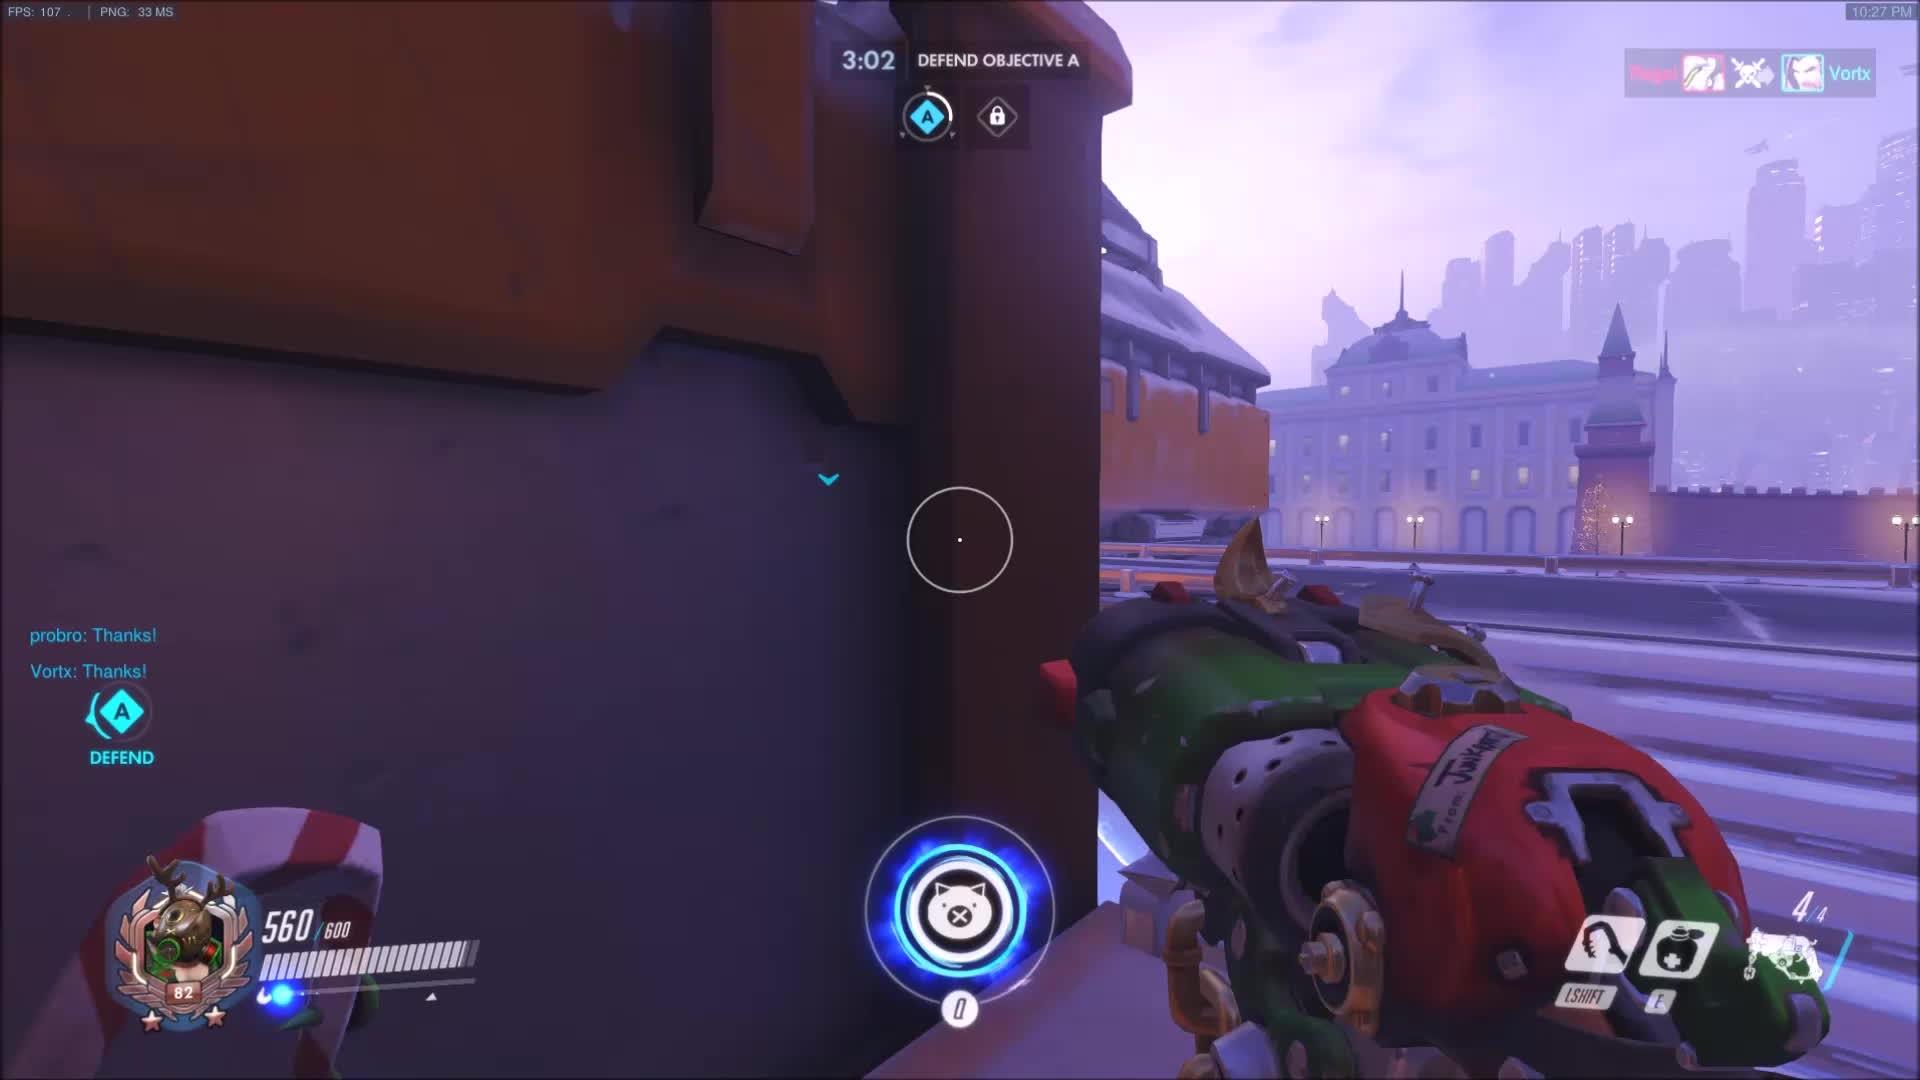 overwatch, Hook broken, Blizz plz fix GIFs